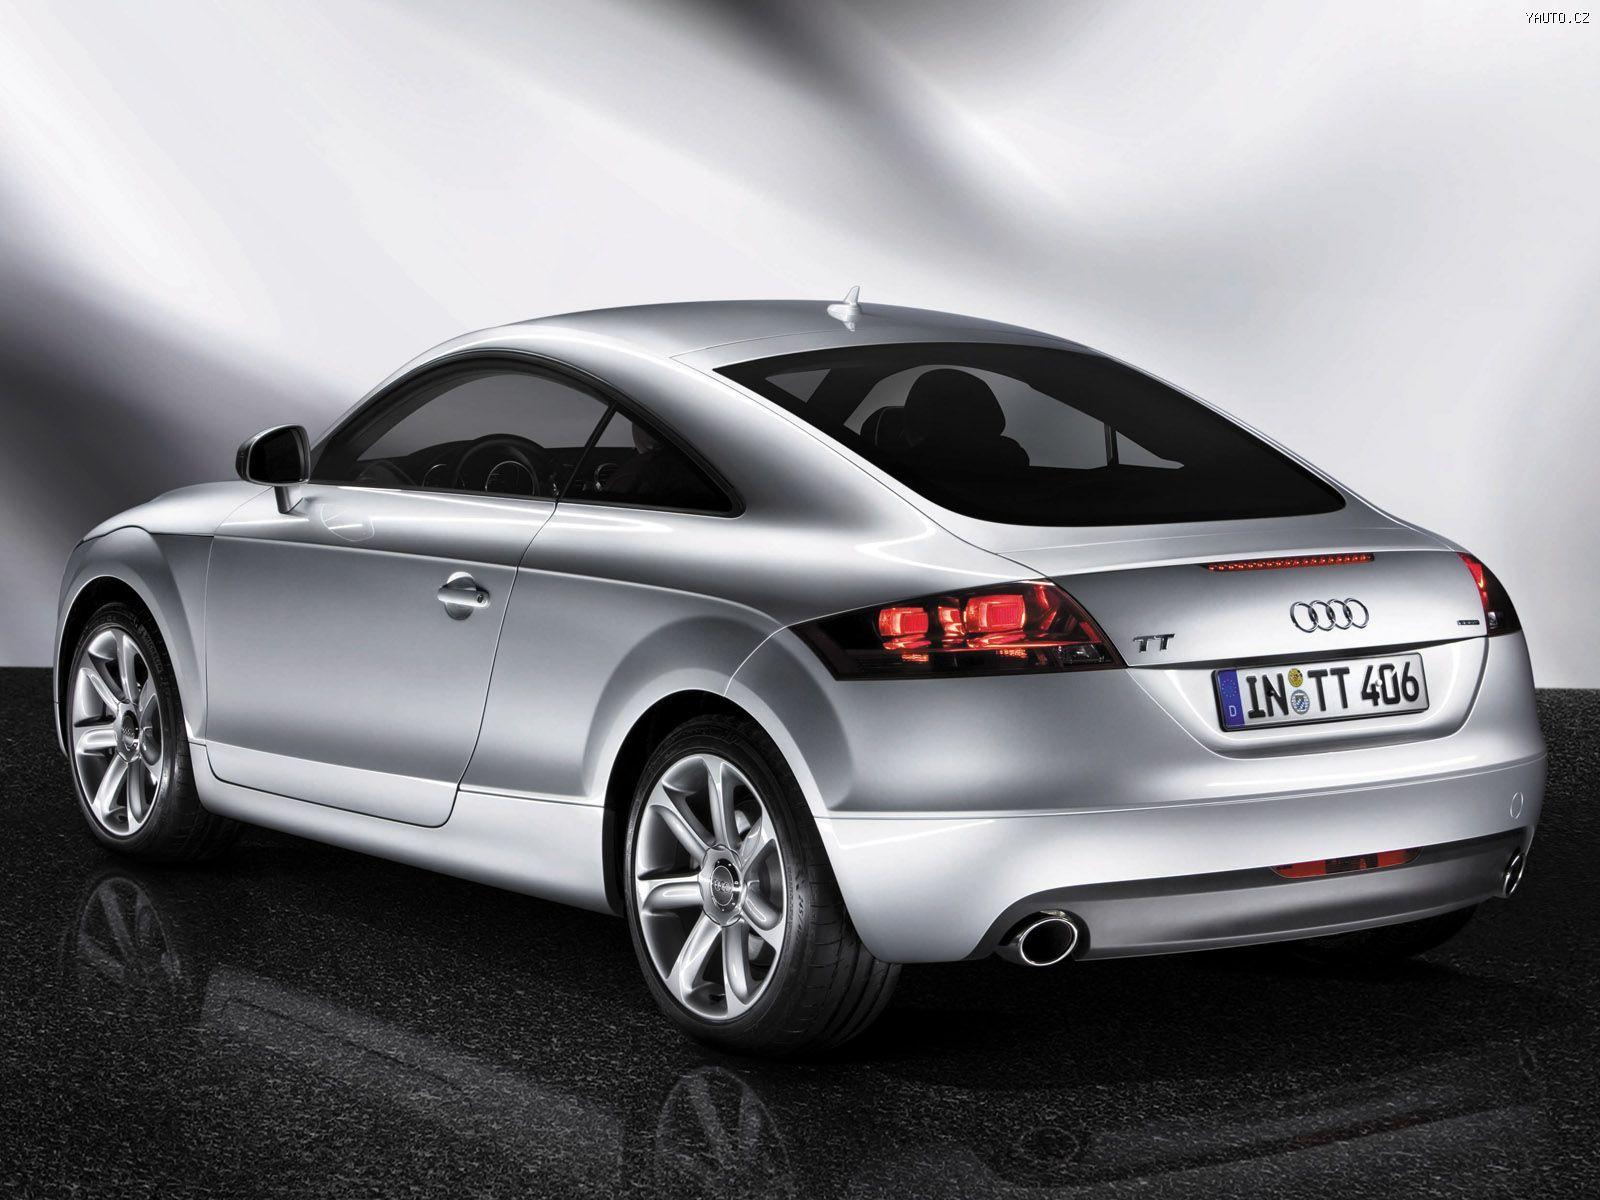 2006 audi tt Audi TT (2006) Auta na plochu, tapety na